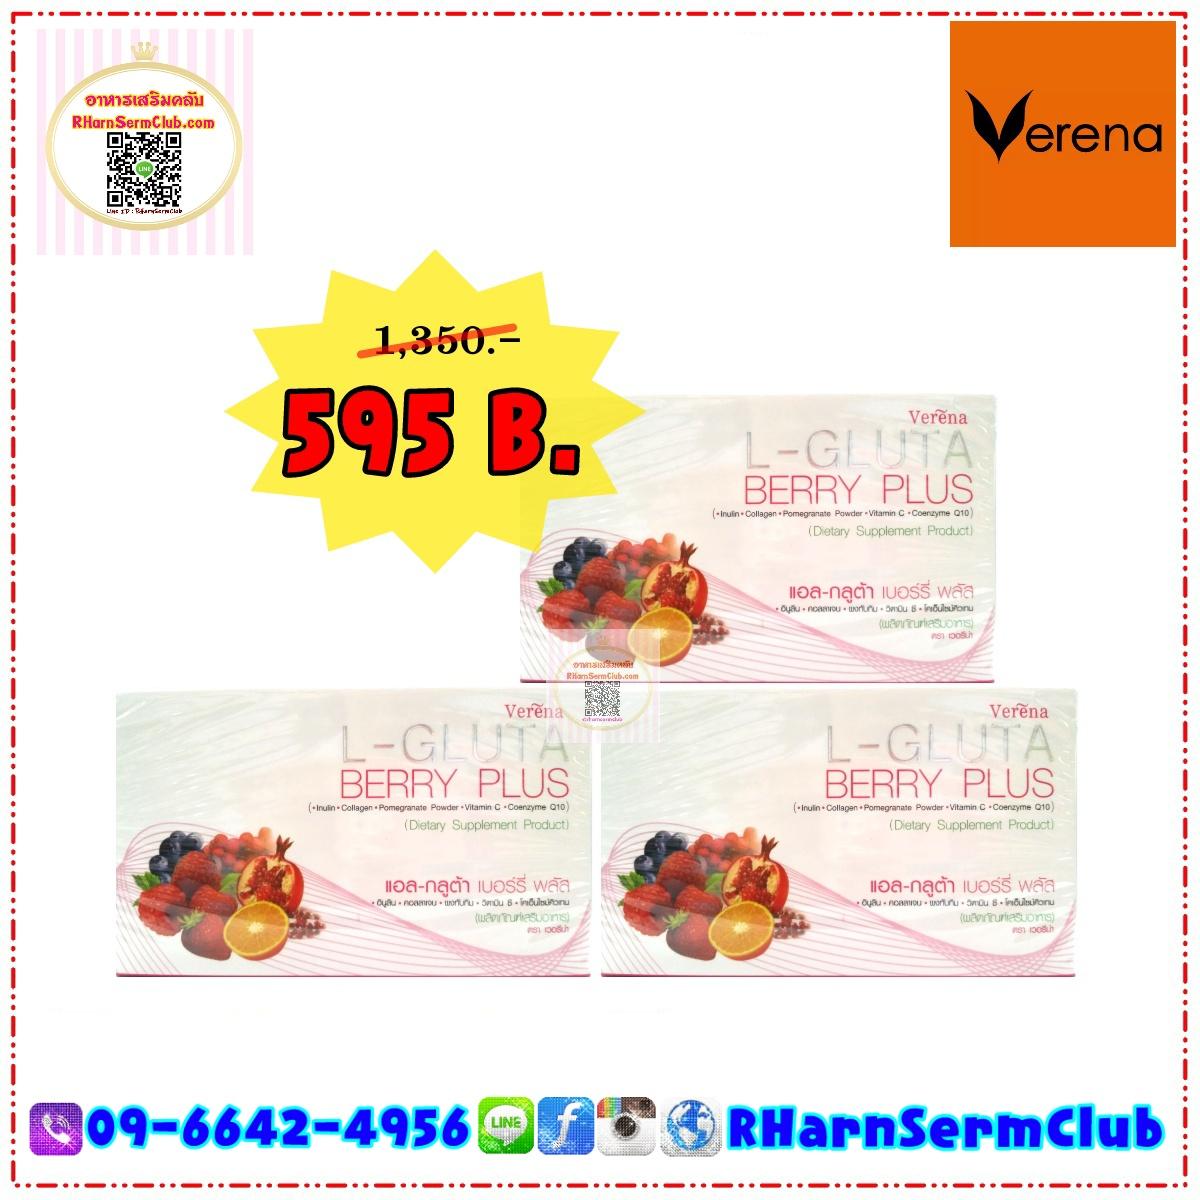 Verena L - Gluta Berry Plus 10 ซอง x 3 กล่อง